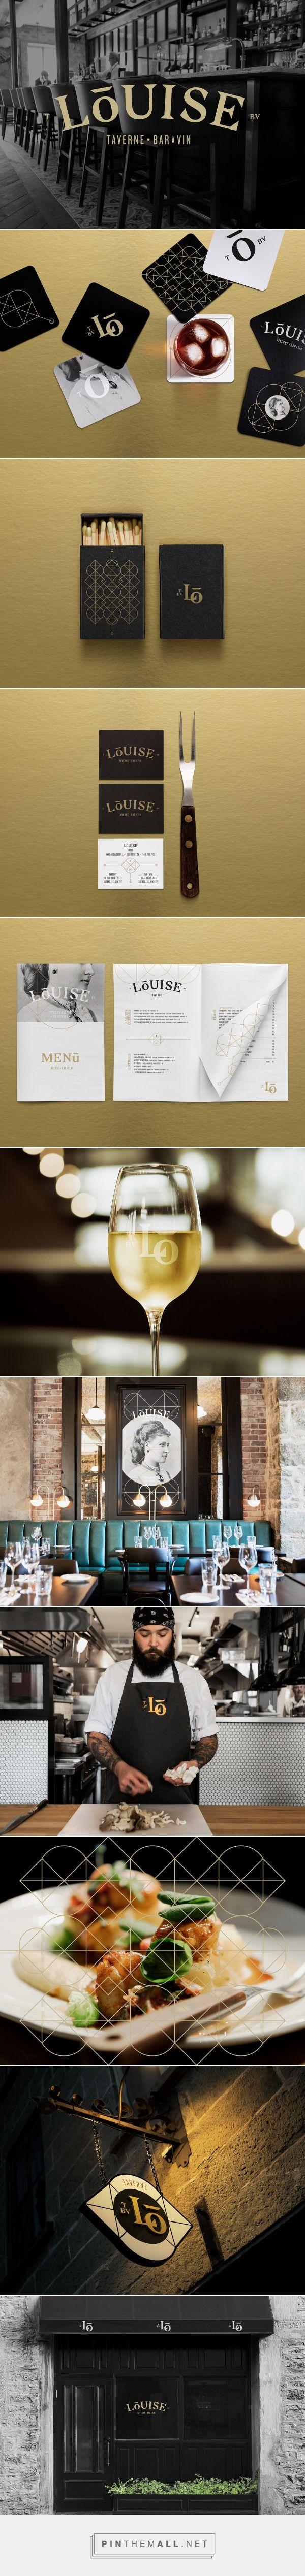 Taverne Louise branding | lg2